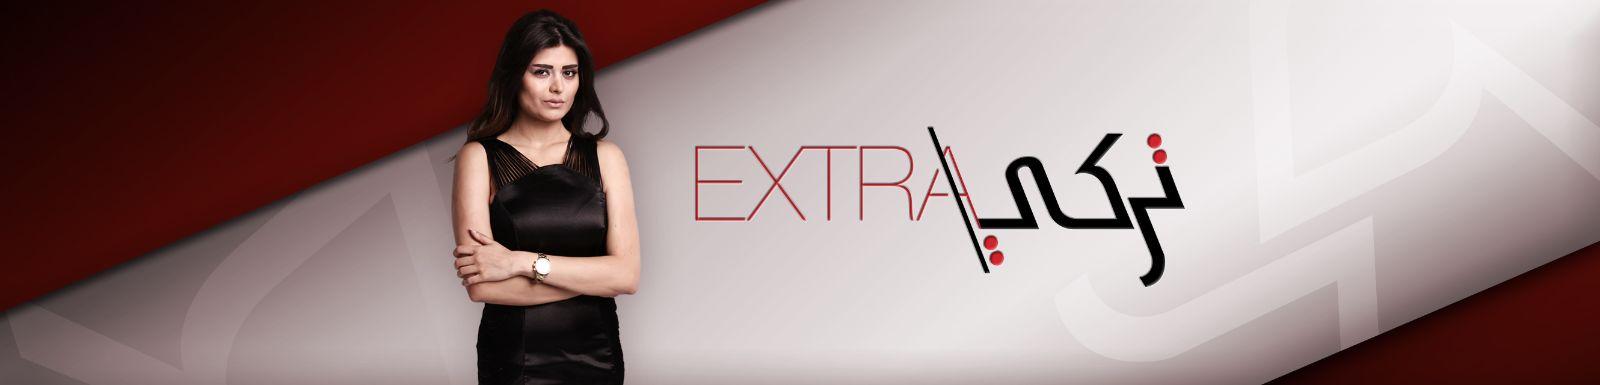 ������ ������ ������ Extra ���� ������ ������ 2 ������ 12 ������� ��� ����� 2014